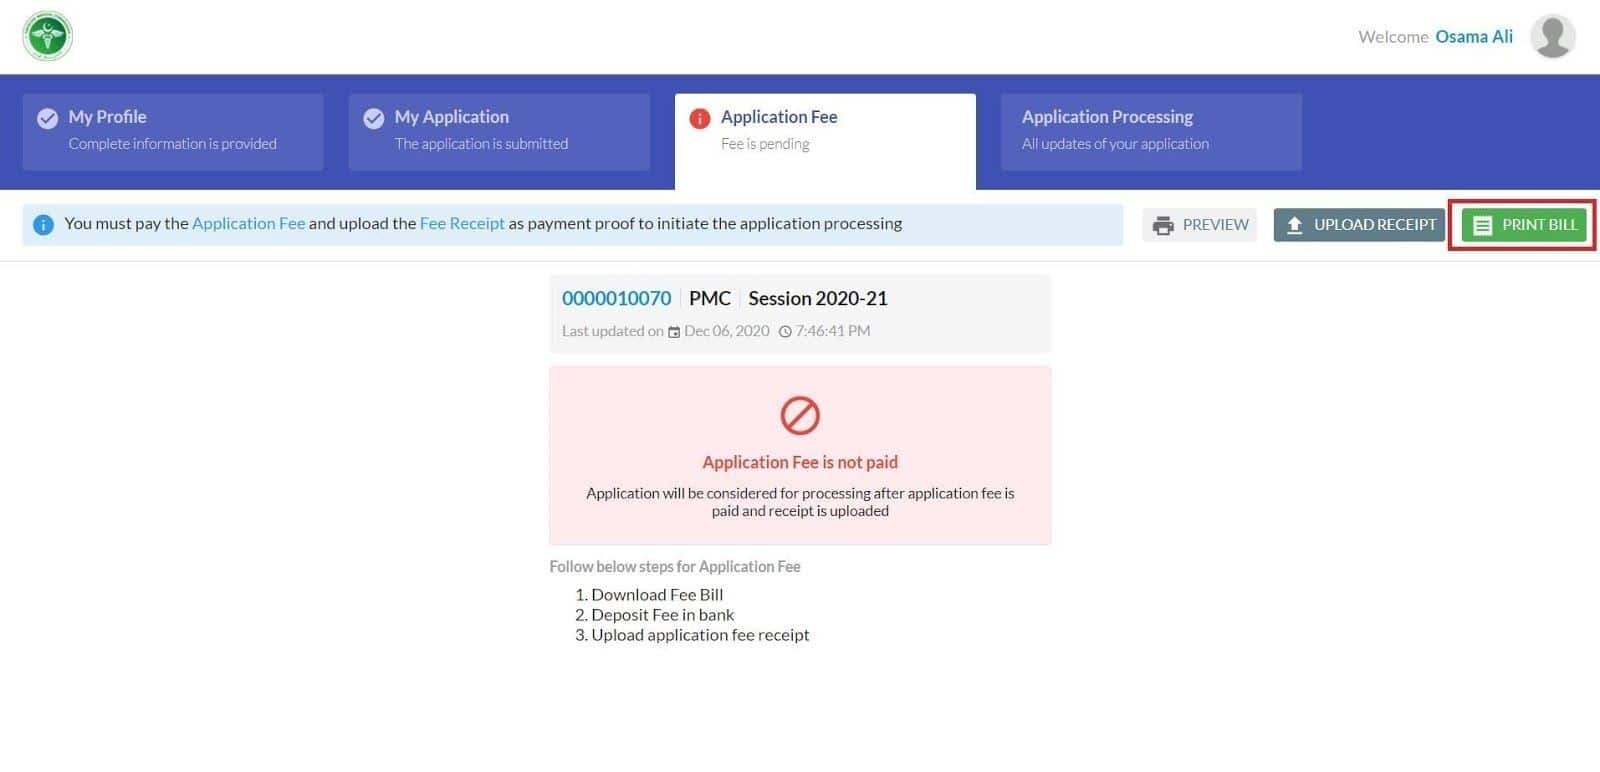 Application Fee-Print Bill 